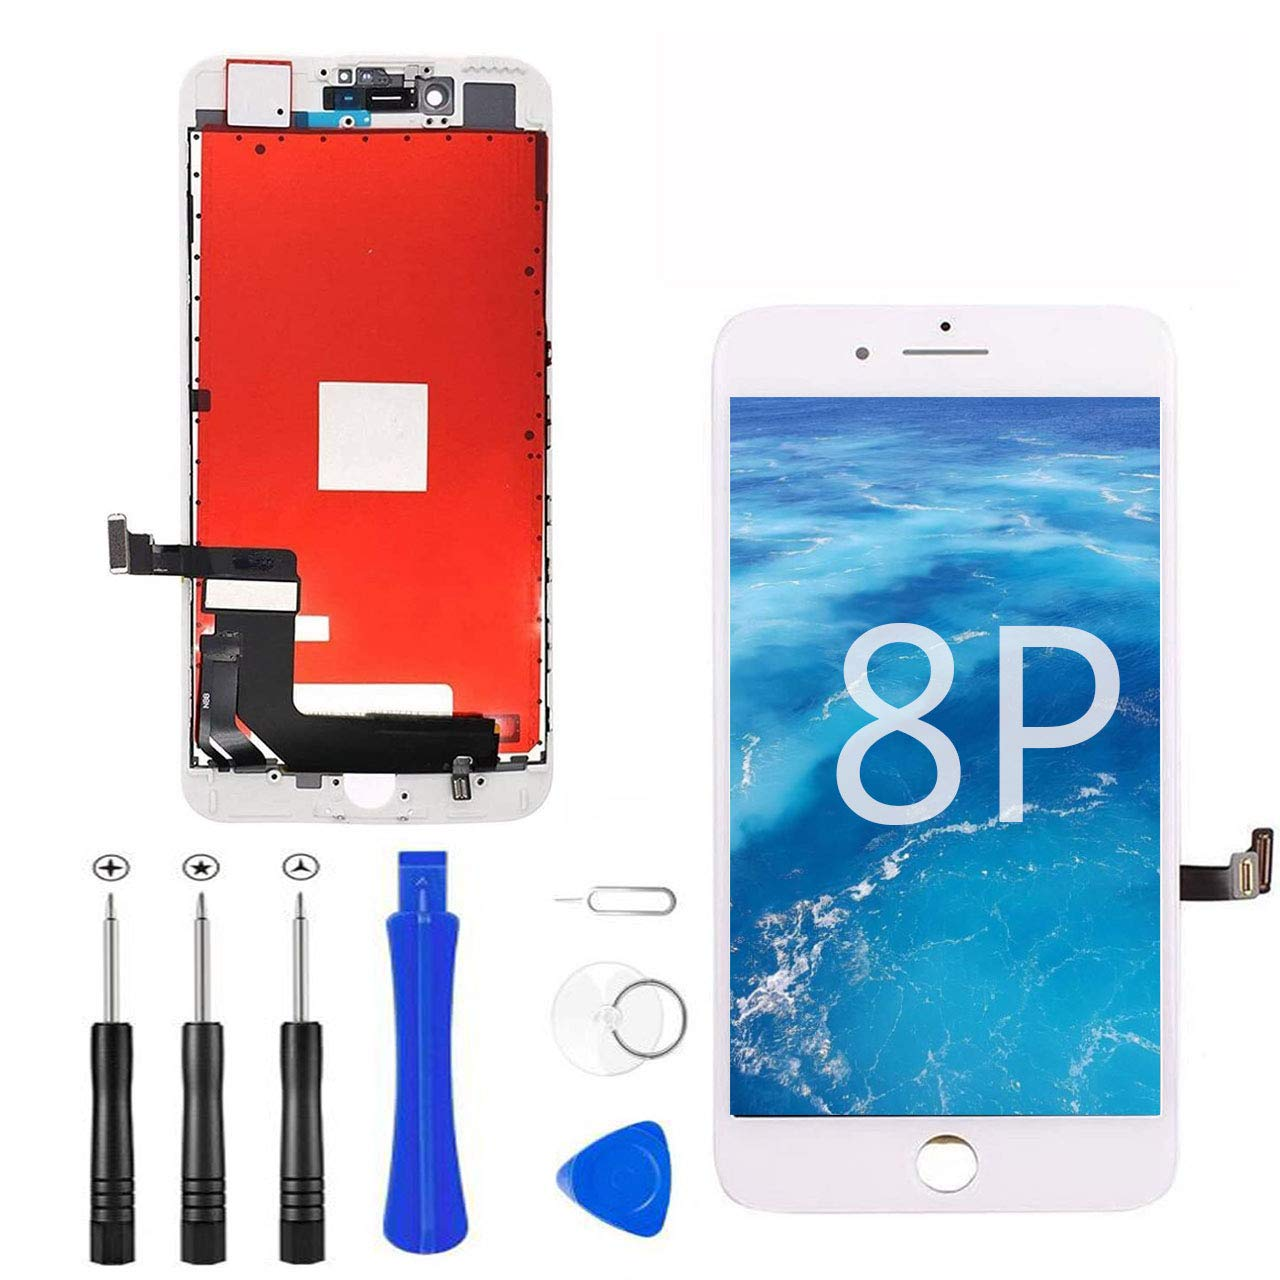 Modulo LCD Blanco para IPhone 8 Plus 5.5 Inch -783